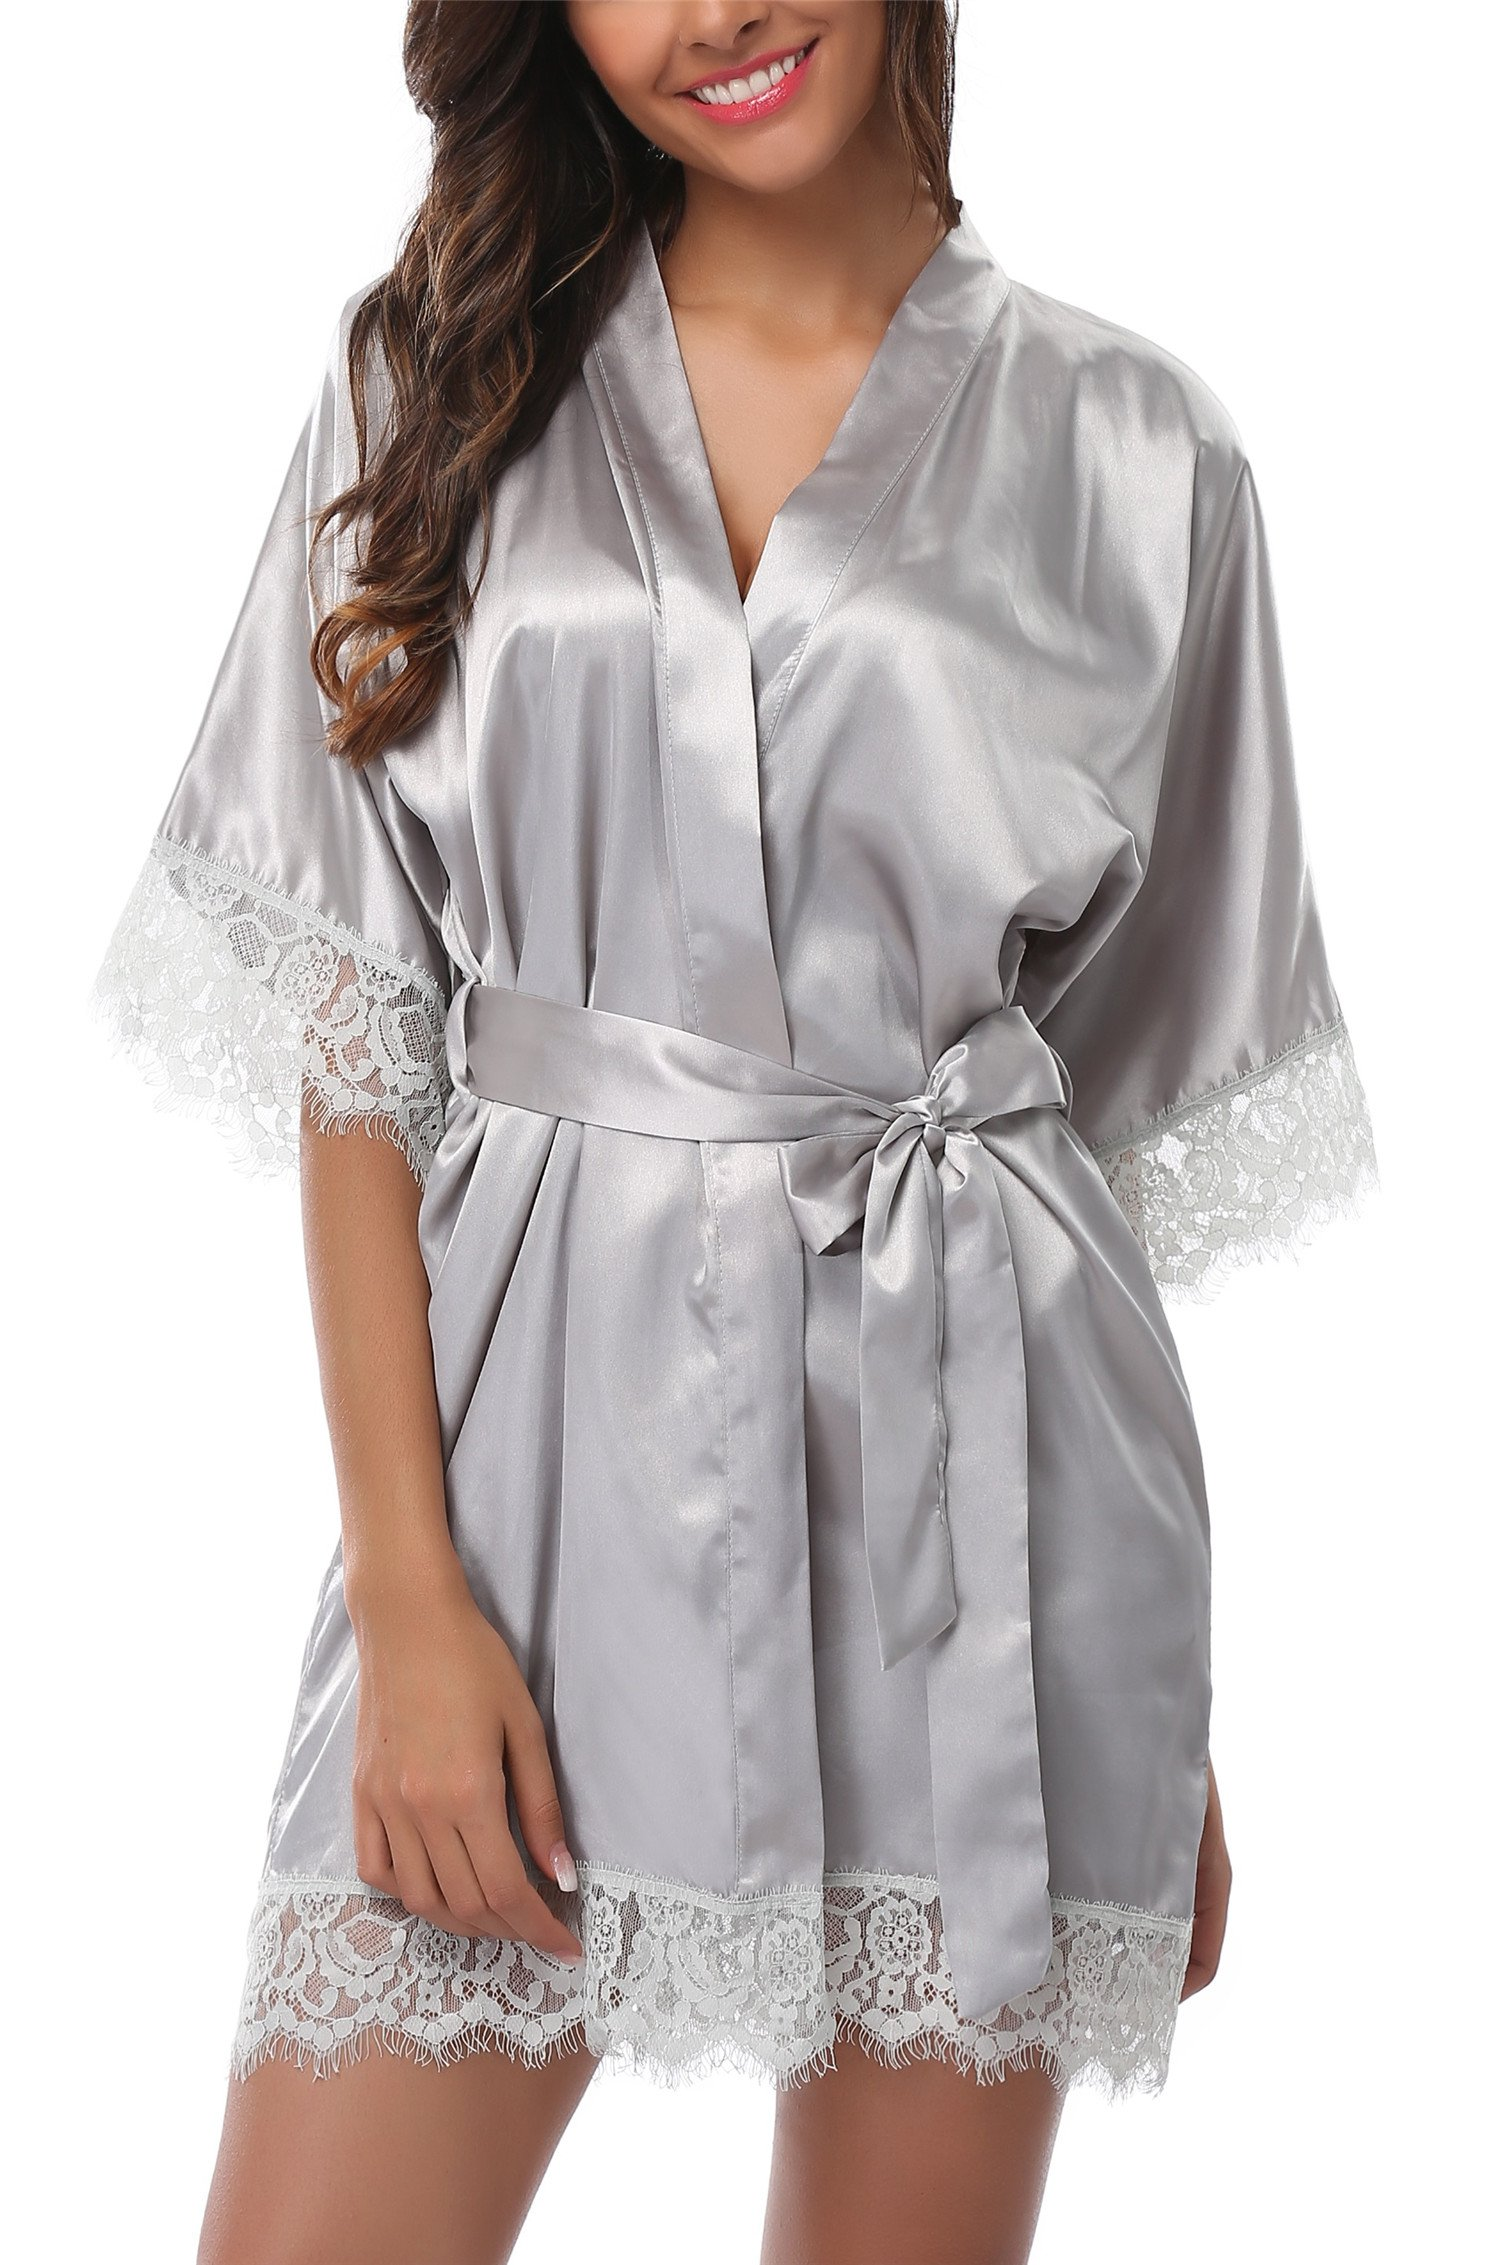 Giova Women's Lace Trim Kimono Robe Nightwear Nightgown Sleepwear Satin Short Robe Light Grey Large